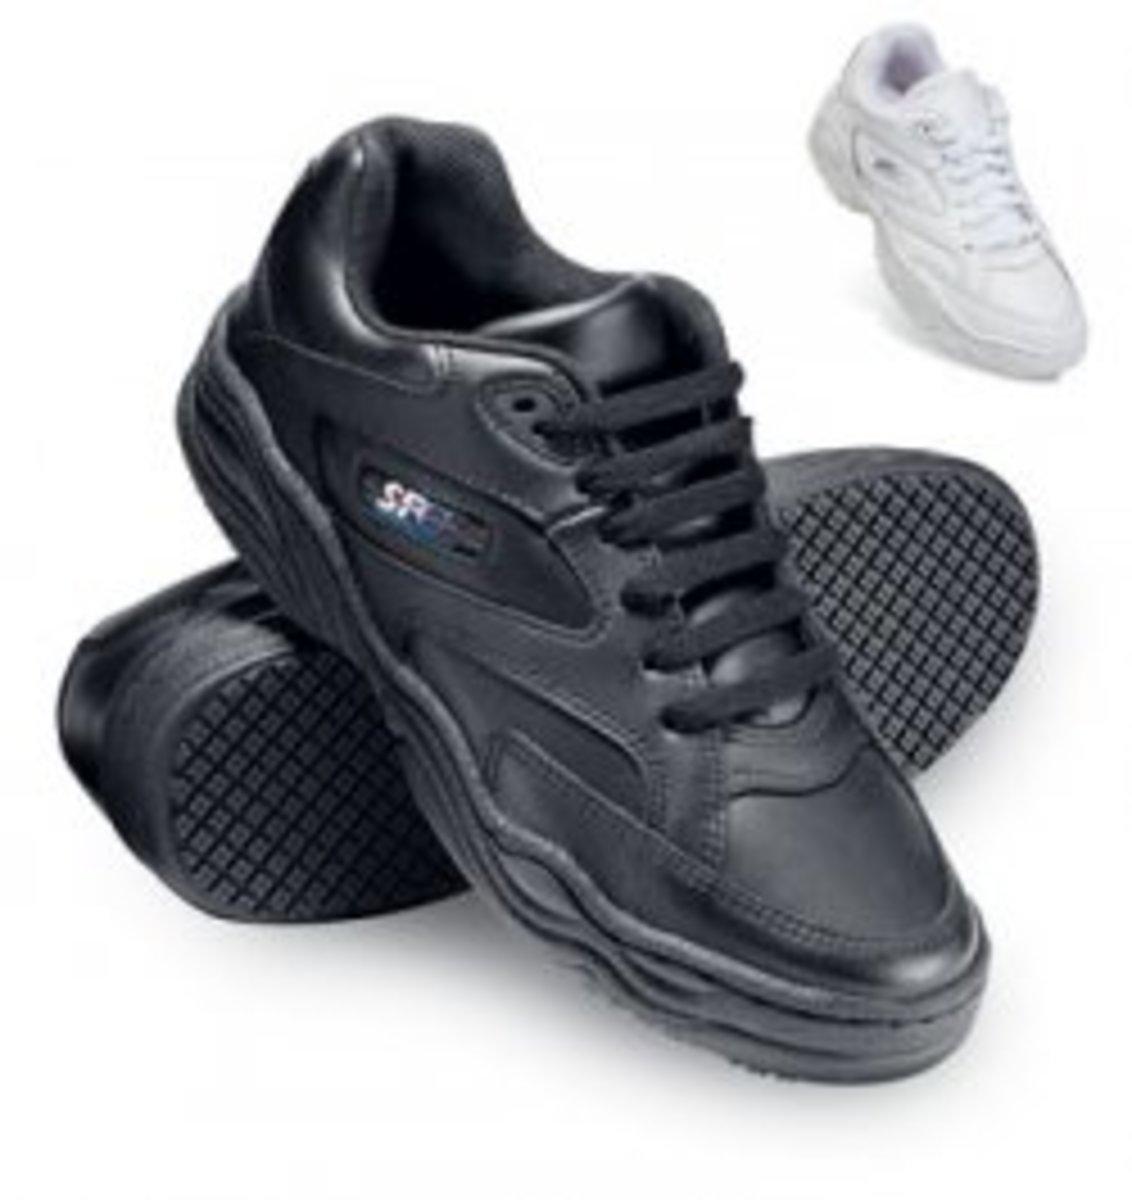 starbucks-shoes-for-work